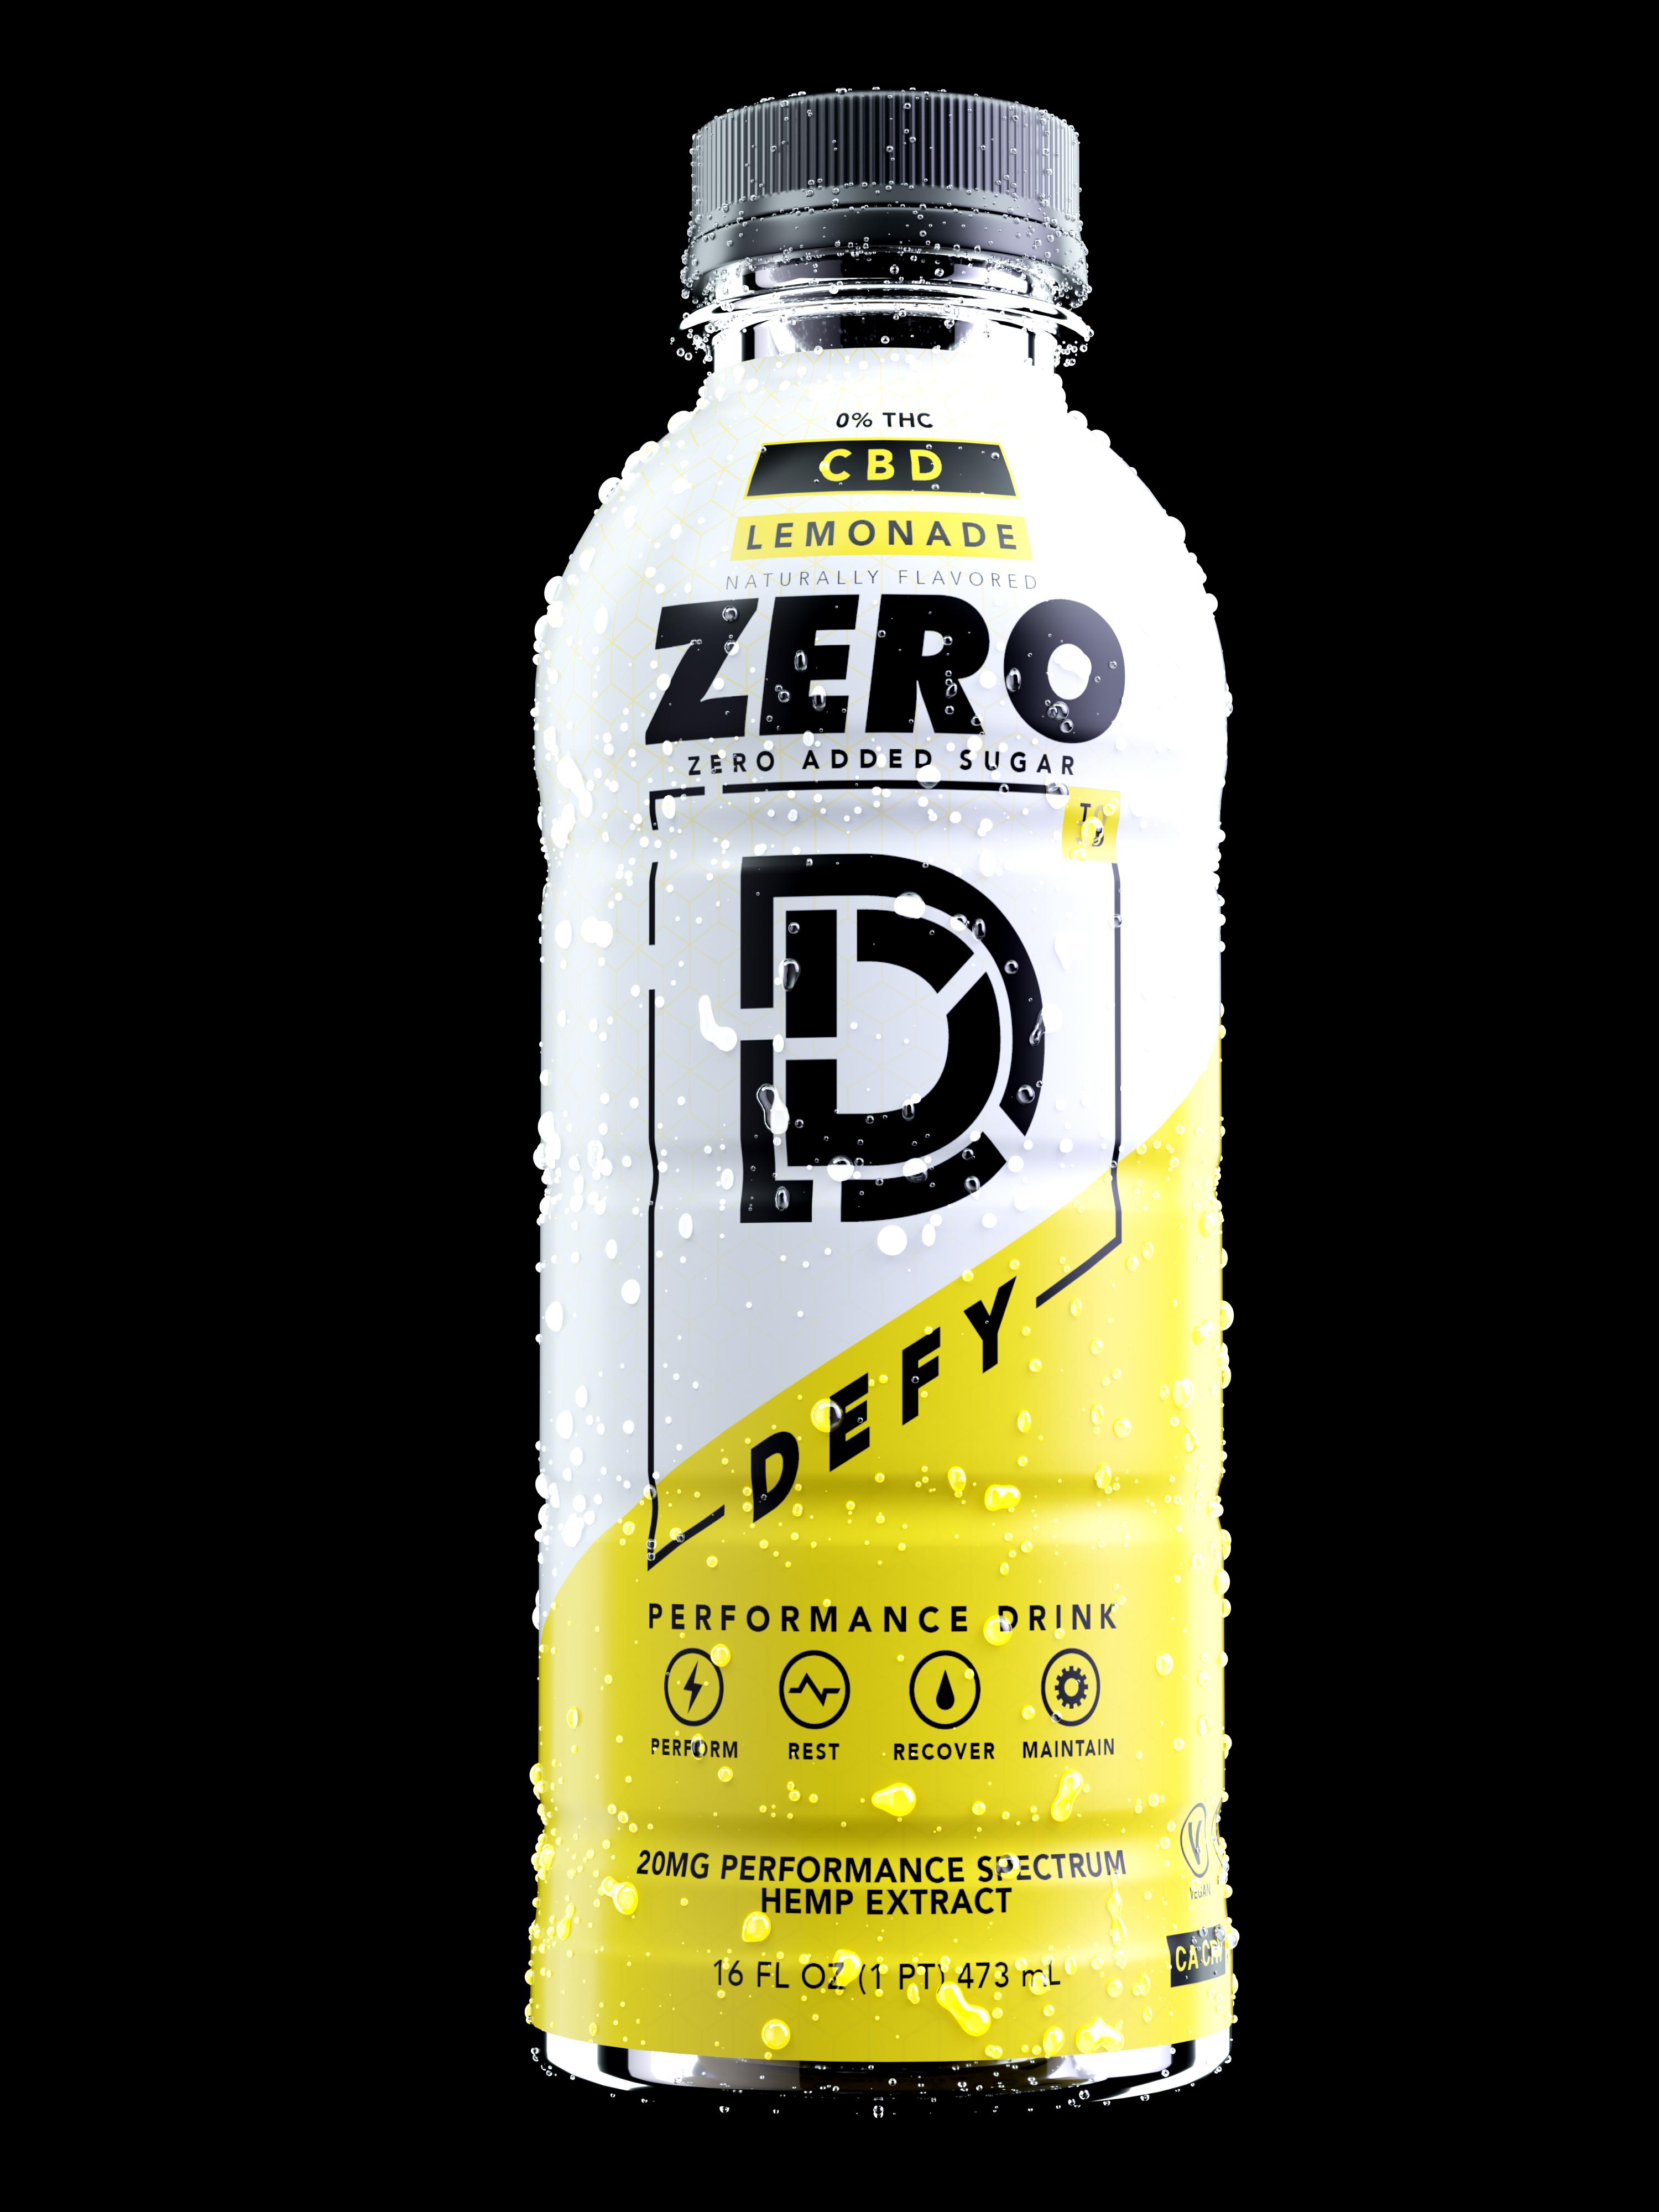 Lemonade ZERO